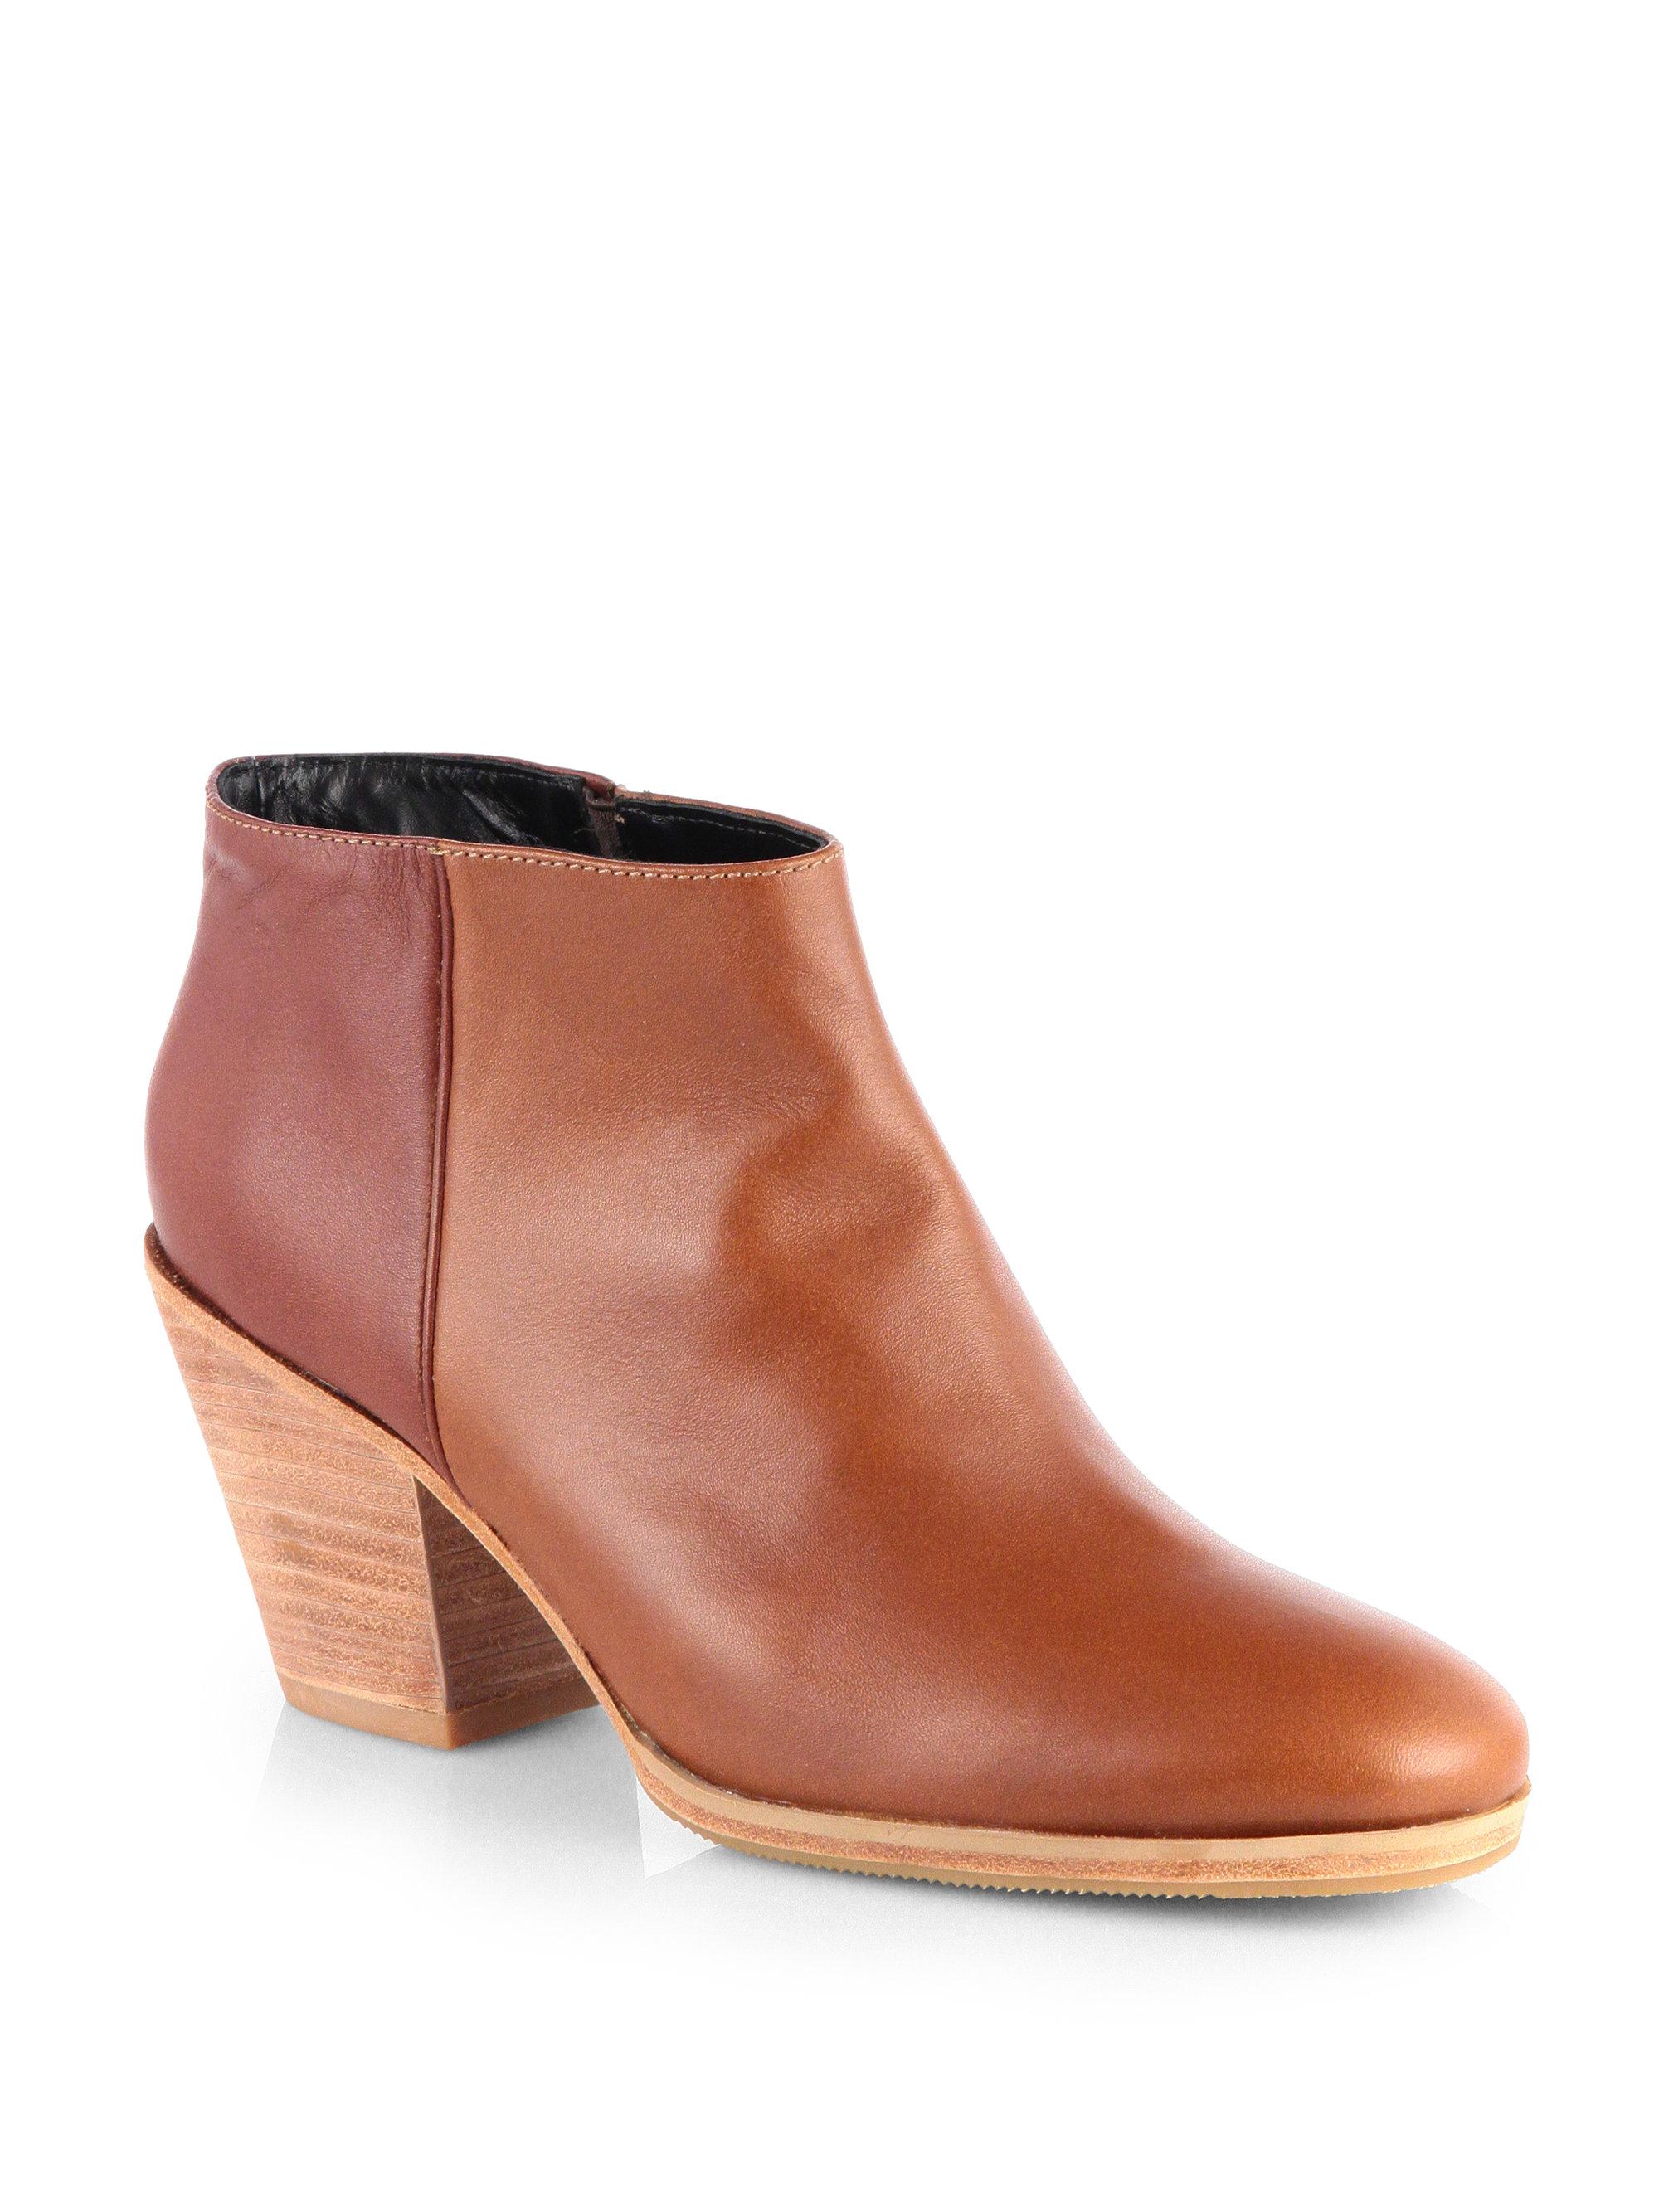 177ebec5b448d Rachel Comey Brown Mars Bicolor Leather Ankle Boots